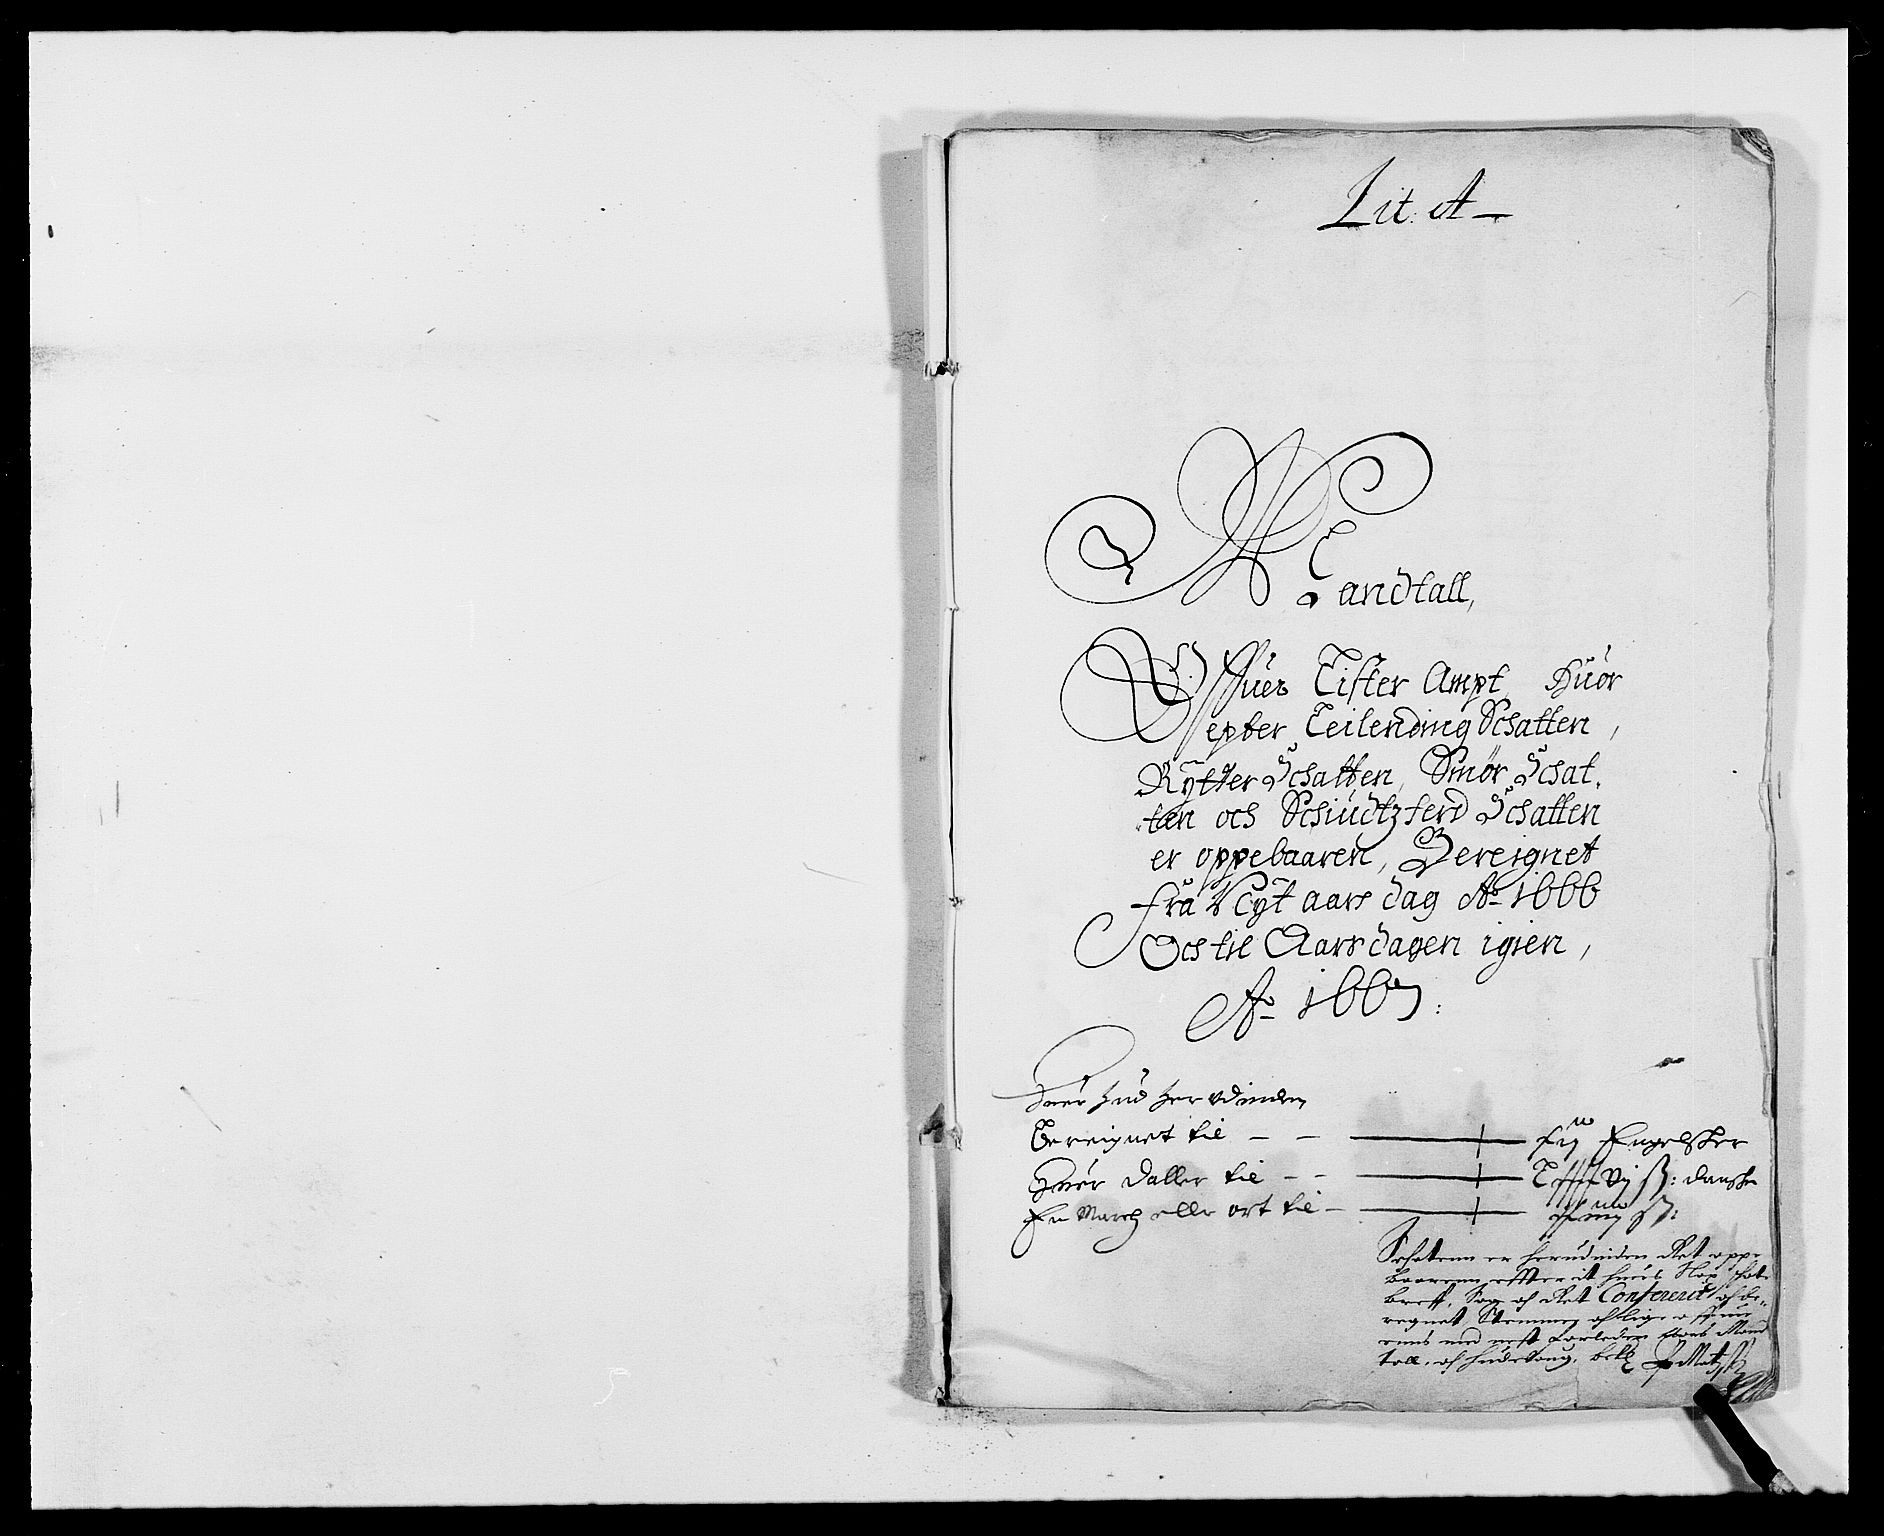 RA, Rentekammeret inntil 1814, Reviderte regnskaper, Fogderegnskap, R41/L2524: Fogderegnskap Lista, 1665-1668, s. 159